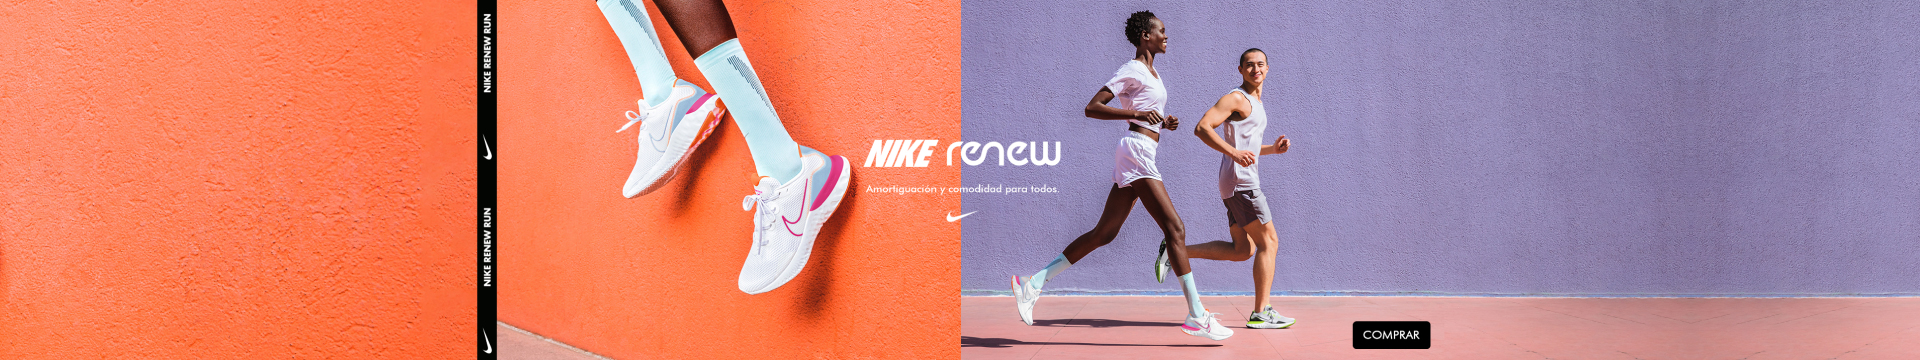 BANNER Nike campaña